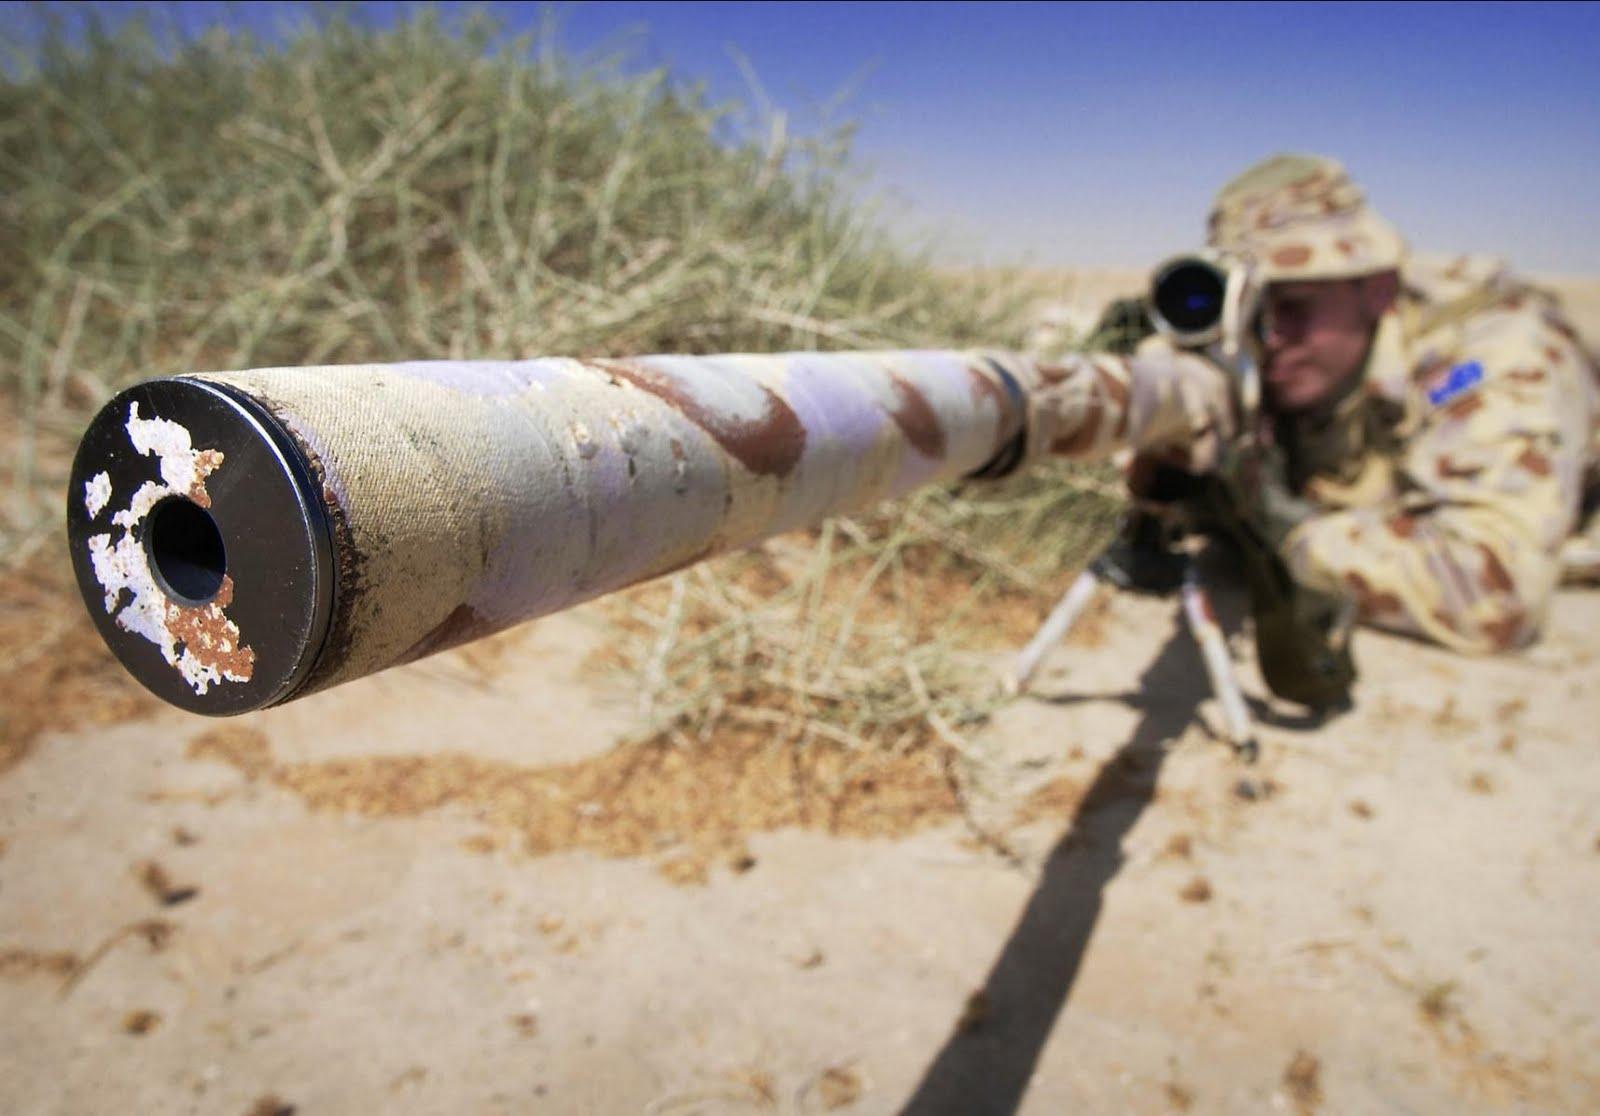 http://1.bp.blogspot.com/-UGCw9rXRtno/TcL-ipByTrI/AAAAAAAAAtM/-1pOSwncKkw/s1600/sniper_3.jpg